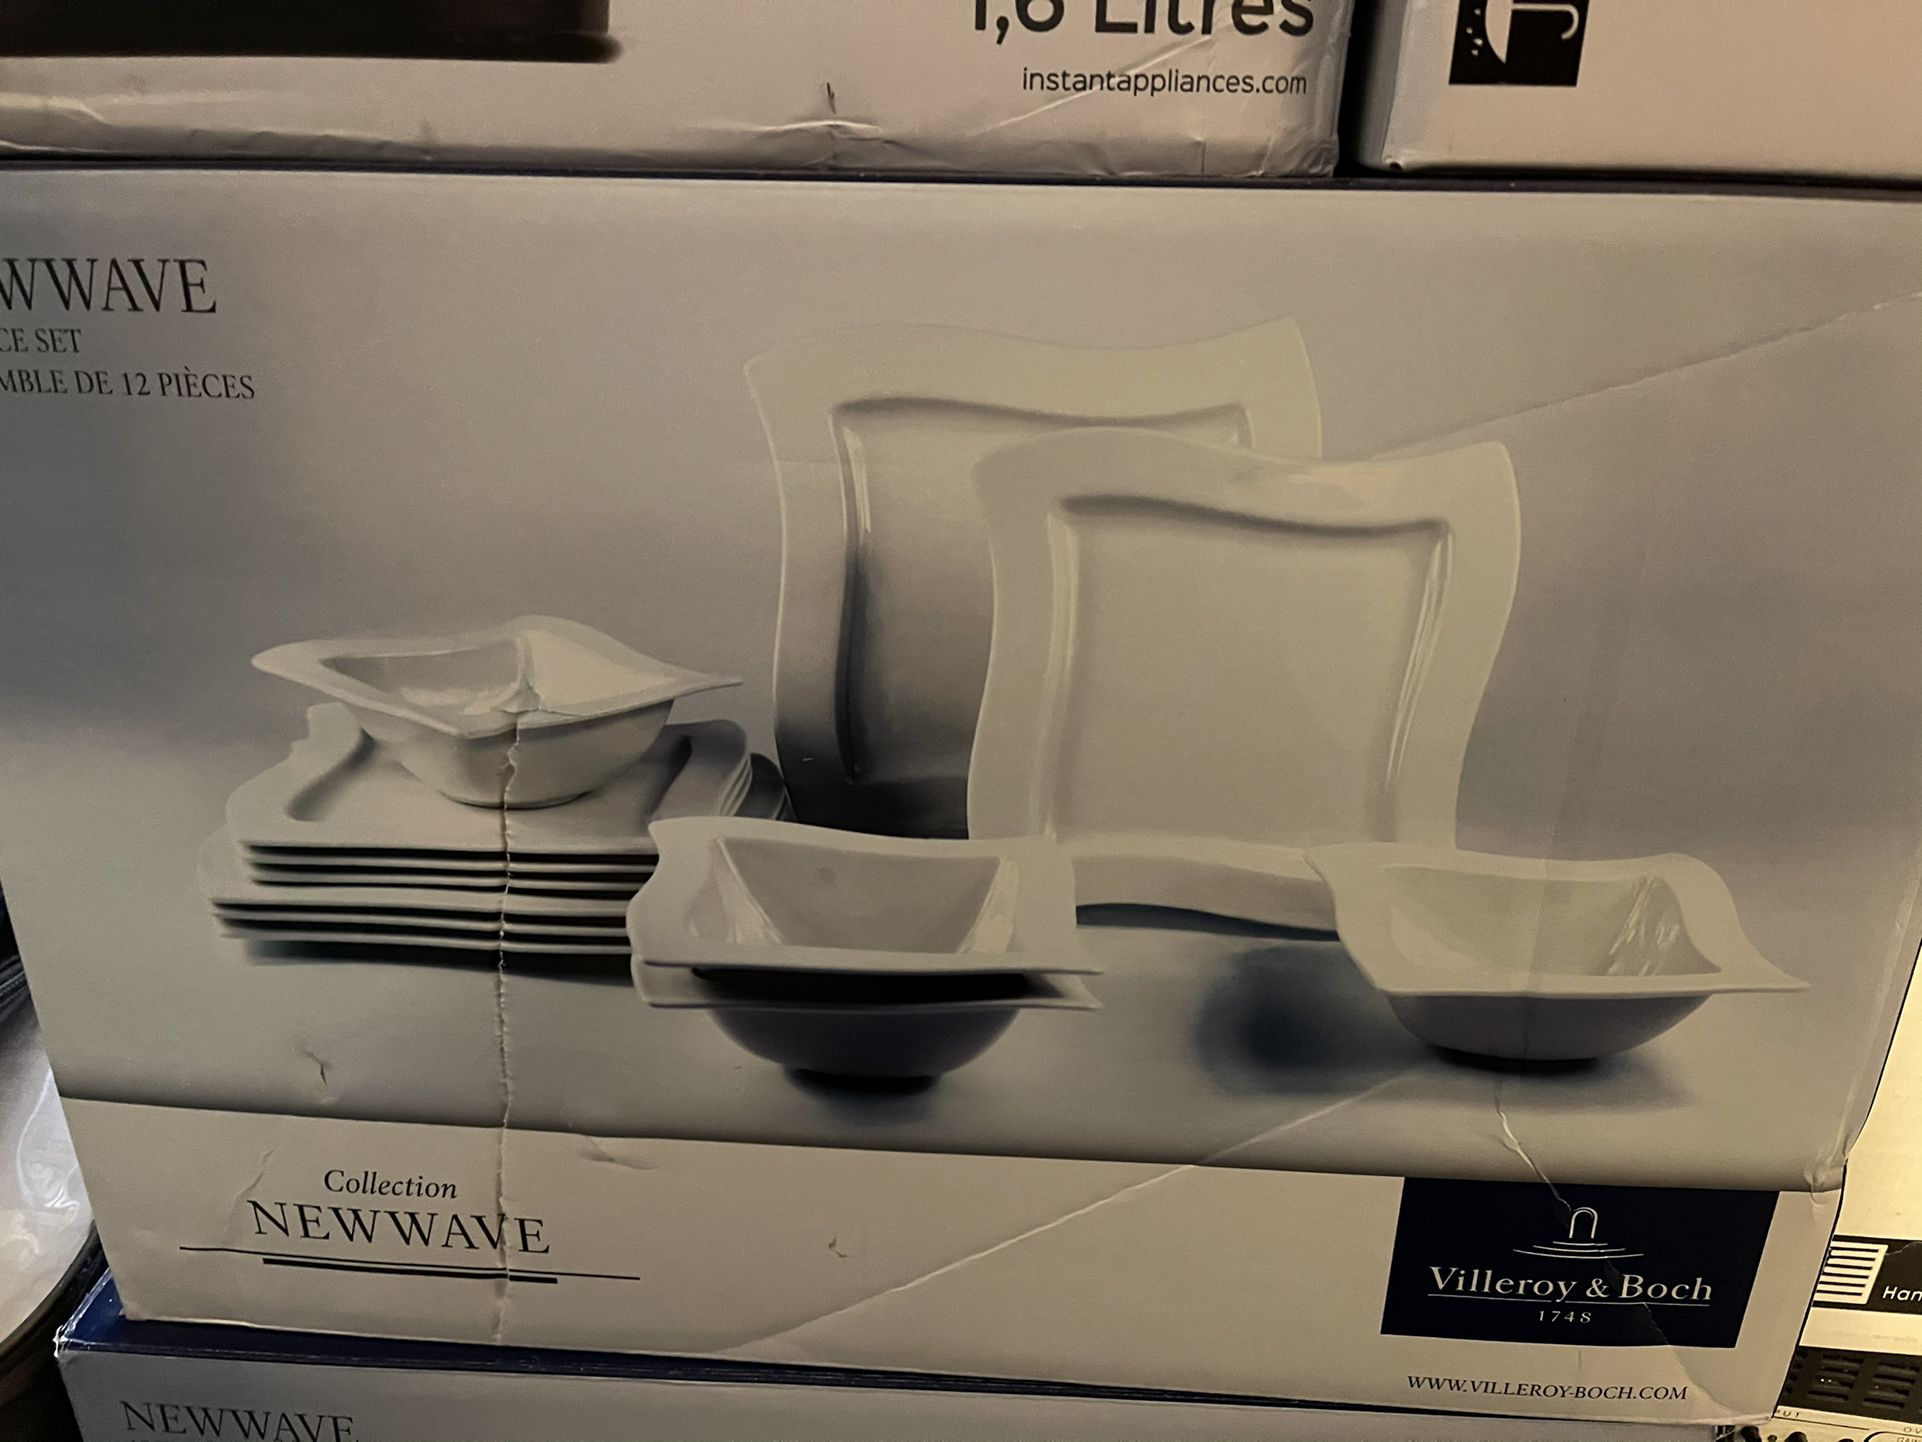 Villeroy & Boch *NEW WAVE Dinnerware Set, 12-Pieces